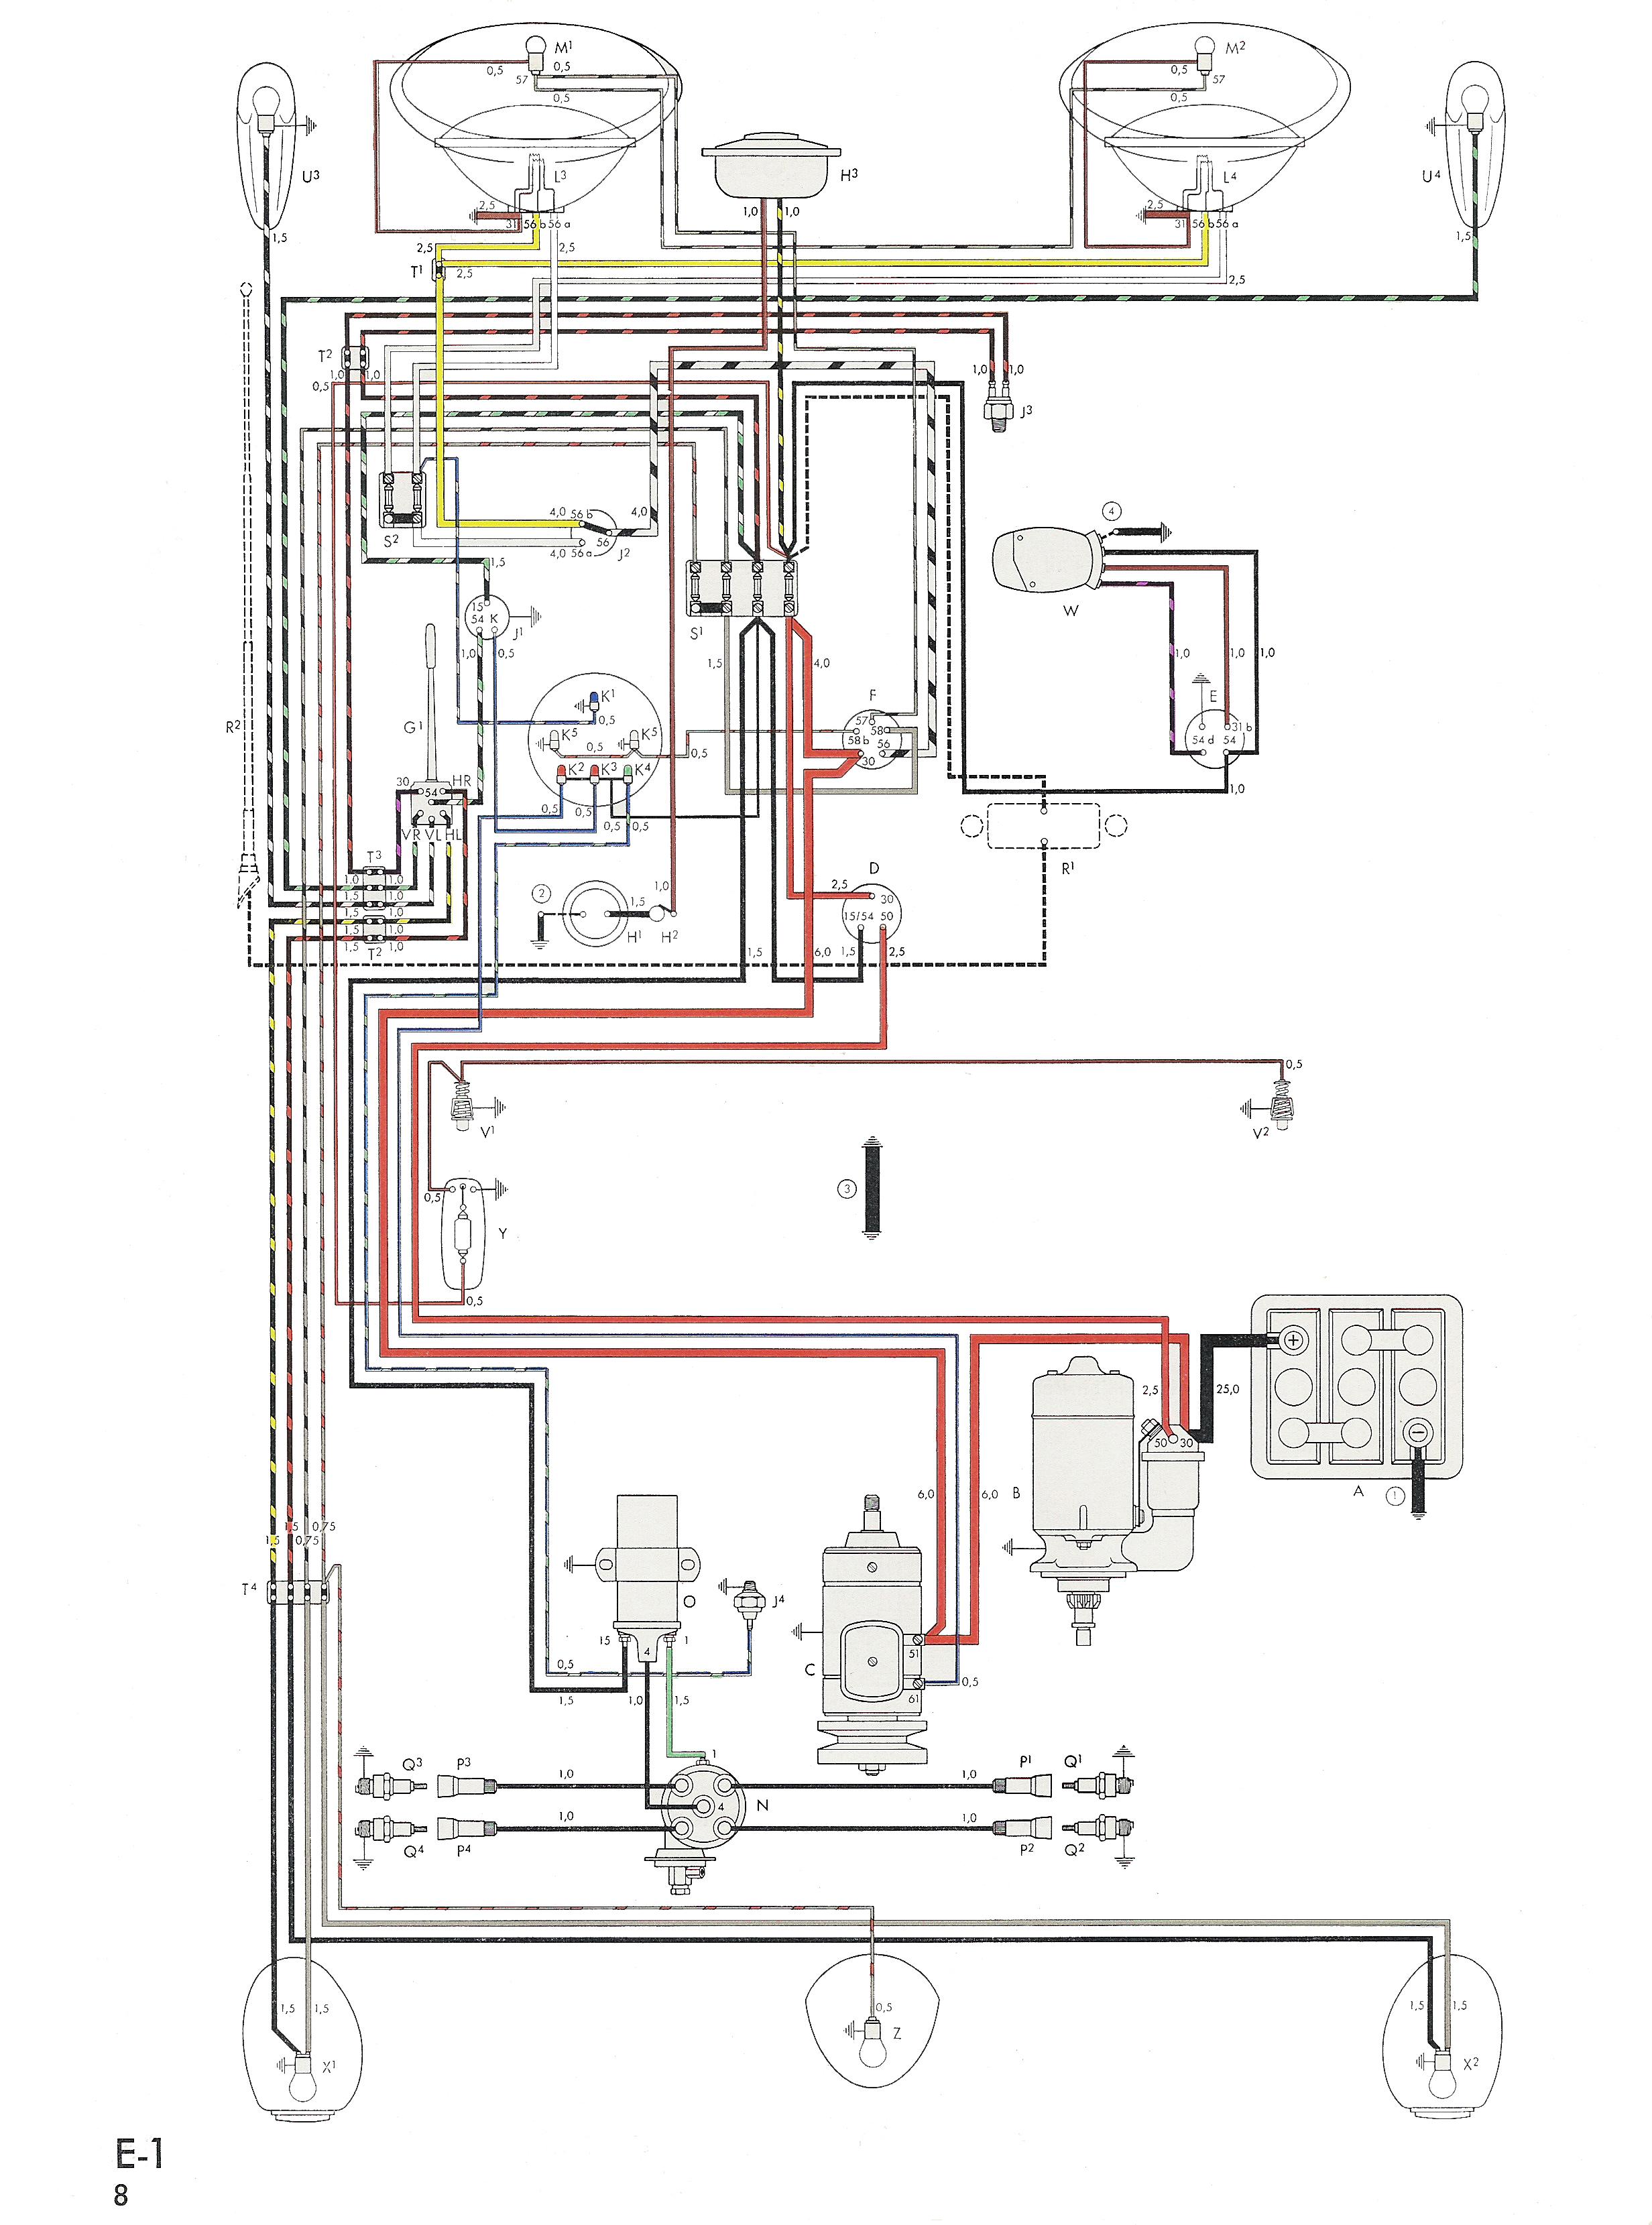 Yamaha g11 wiring diagram boat wiring diagram symbols Motorcycle Wiring Schematics 1998 Yamaha R1 Wiring-Diagram yamaha zuma 50 wiring diagram